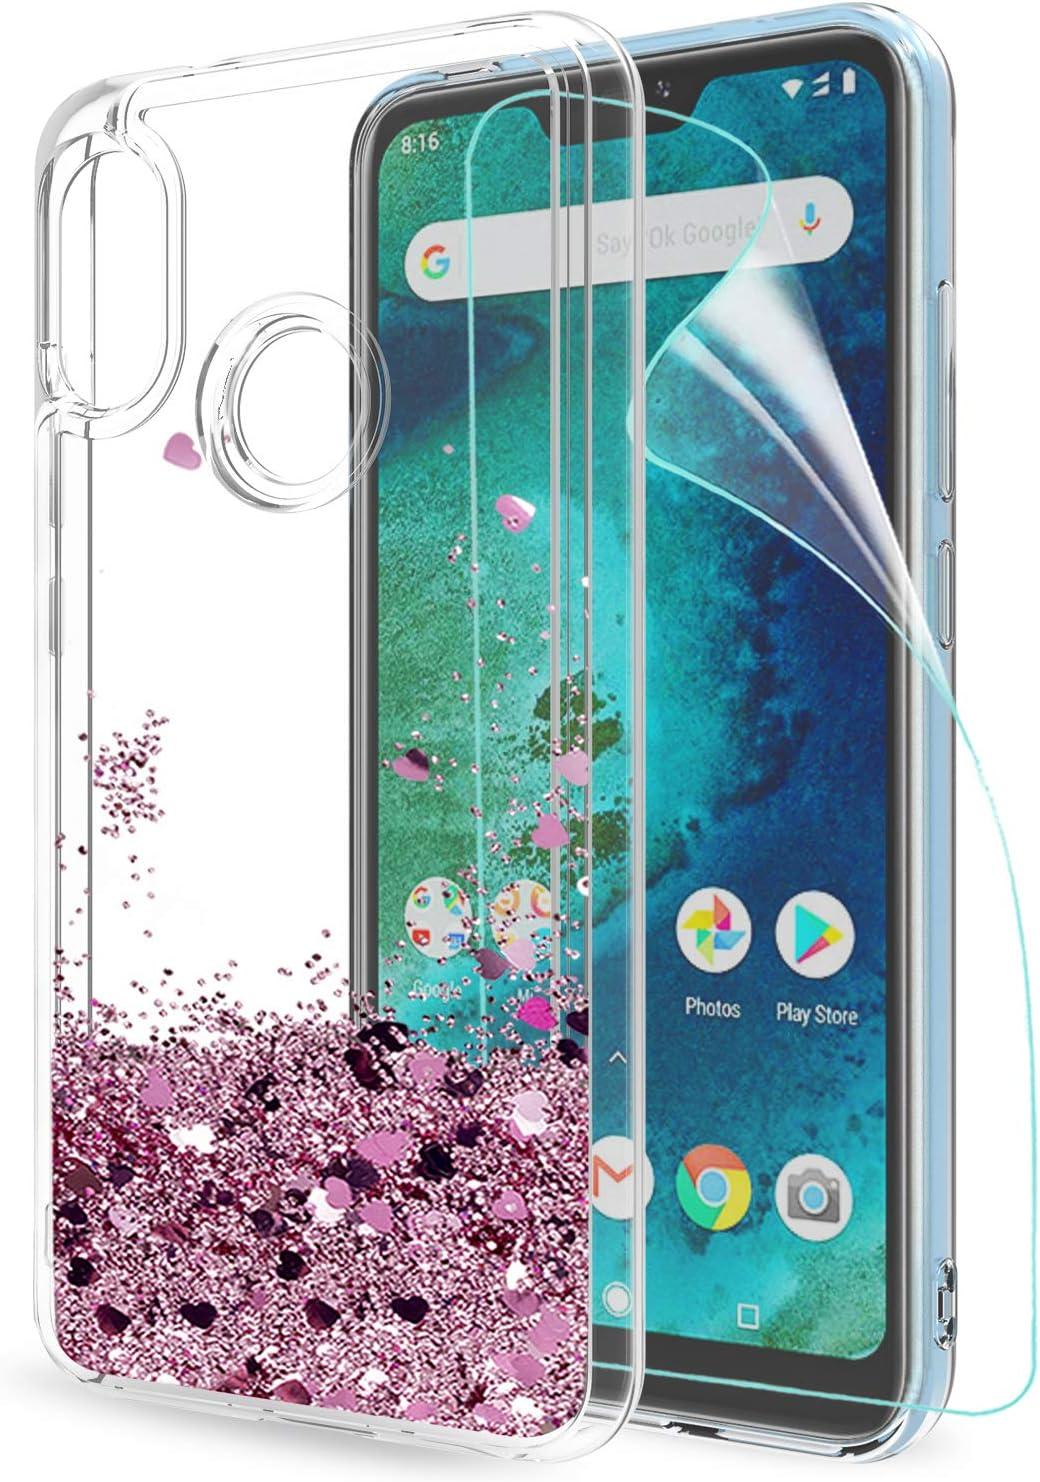 LeYi Funda Xiaomi Mi A2 Lite/Redmi 6 Pro Silicona Purpurina Carcasa con HD Protectores Transparente Cristal Bumper Telefono Gel TPU Fundas Case Cover para Movil Mi A2 Lite ZX Oro Rosa